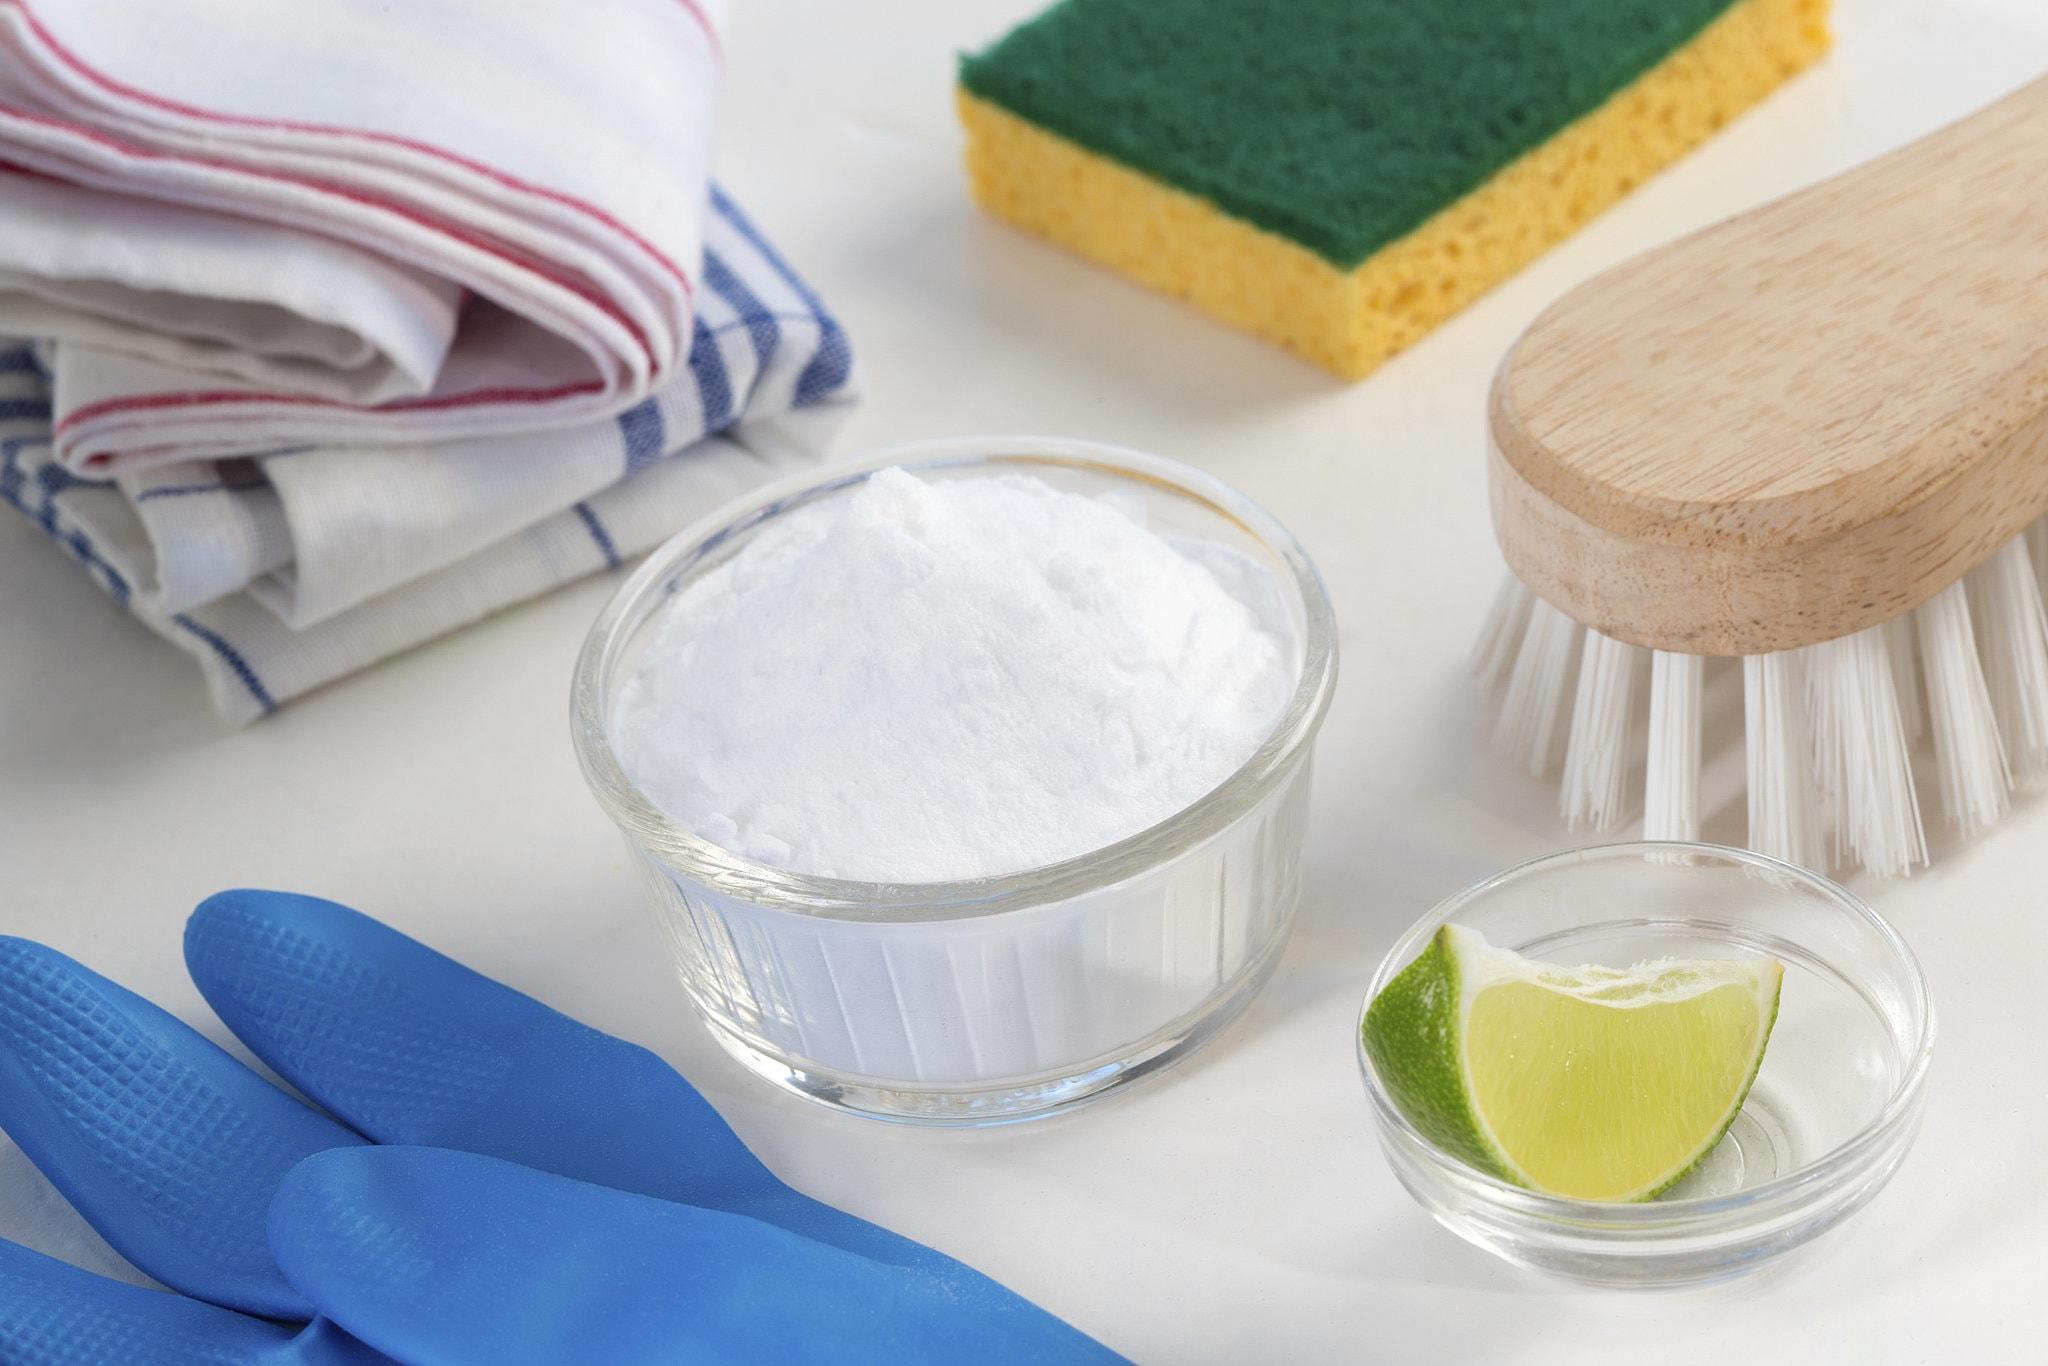 panno-limone-per-pulire-argento